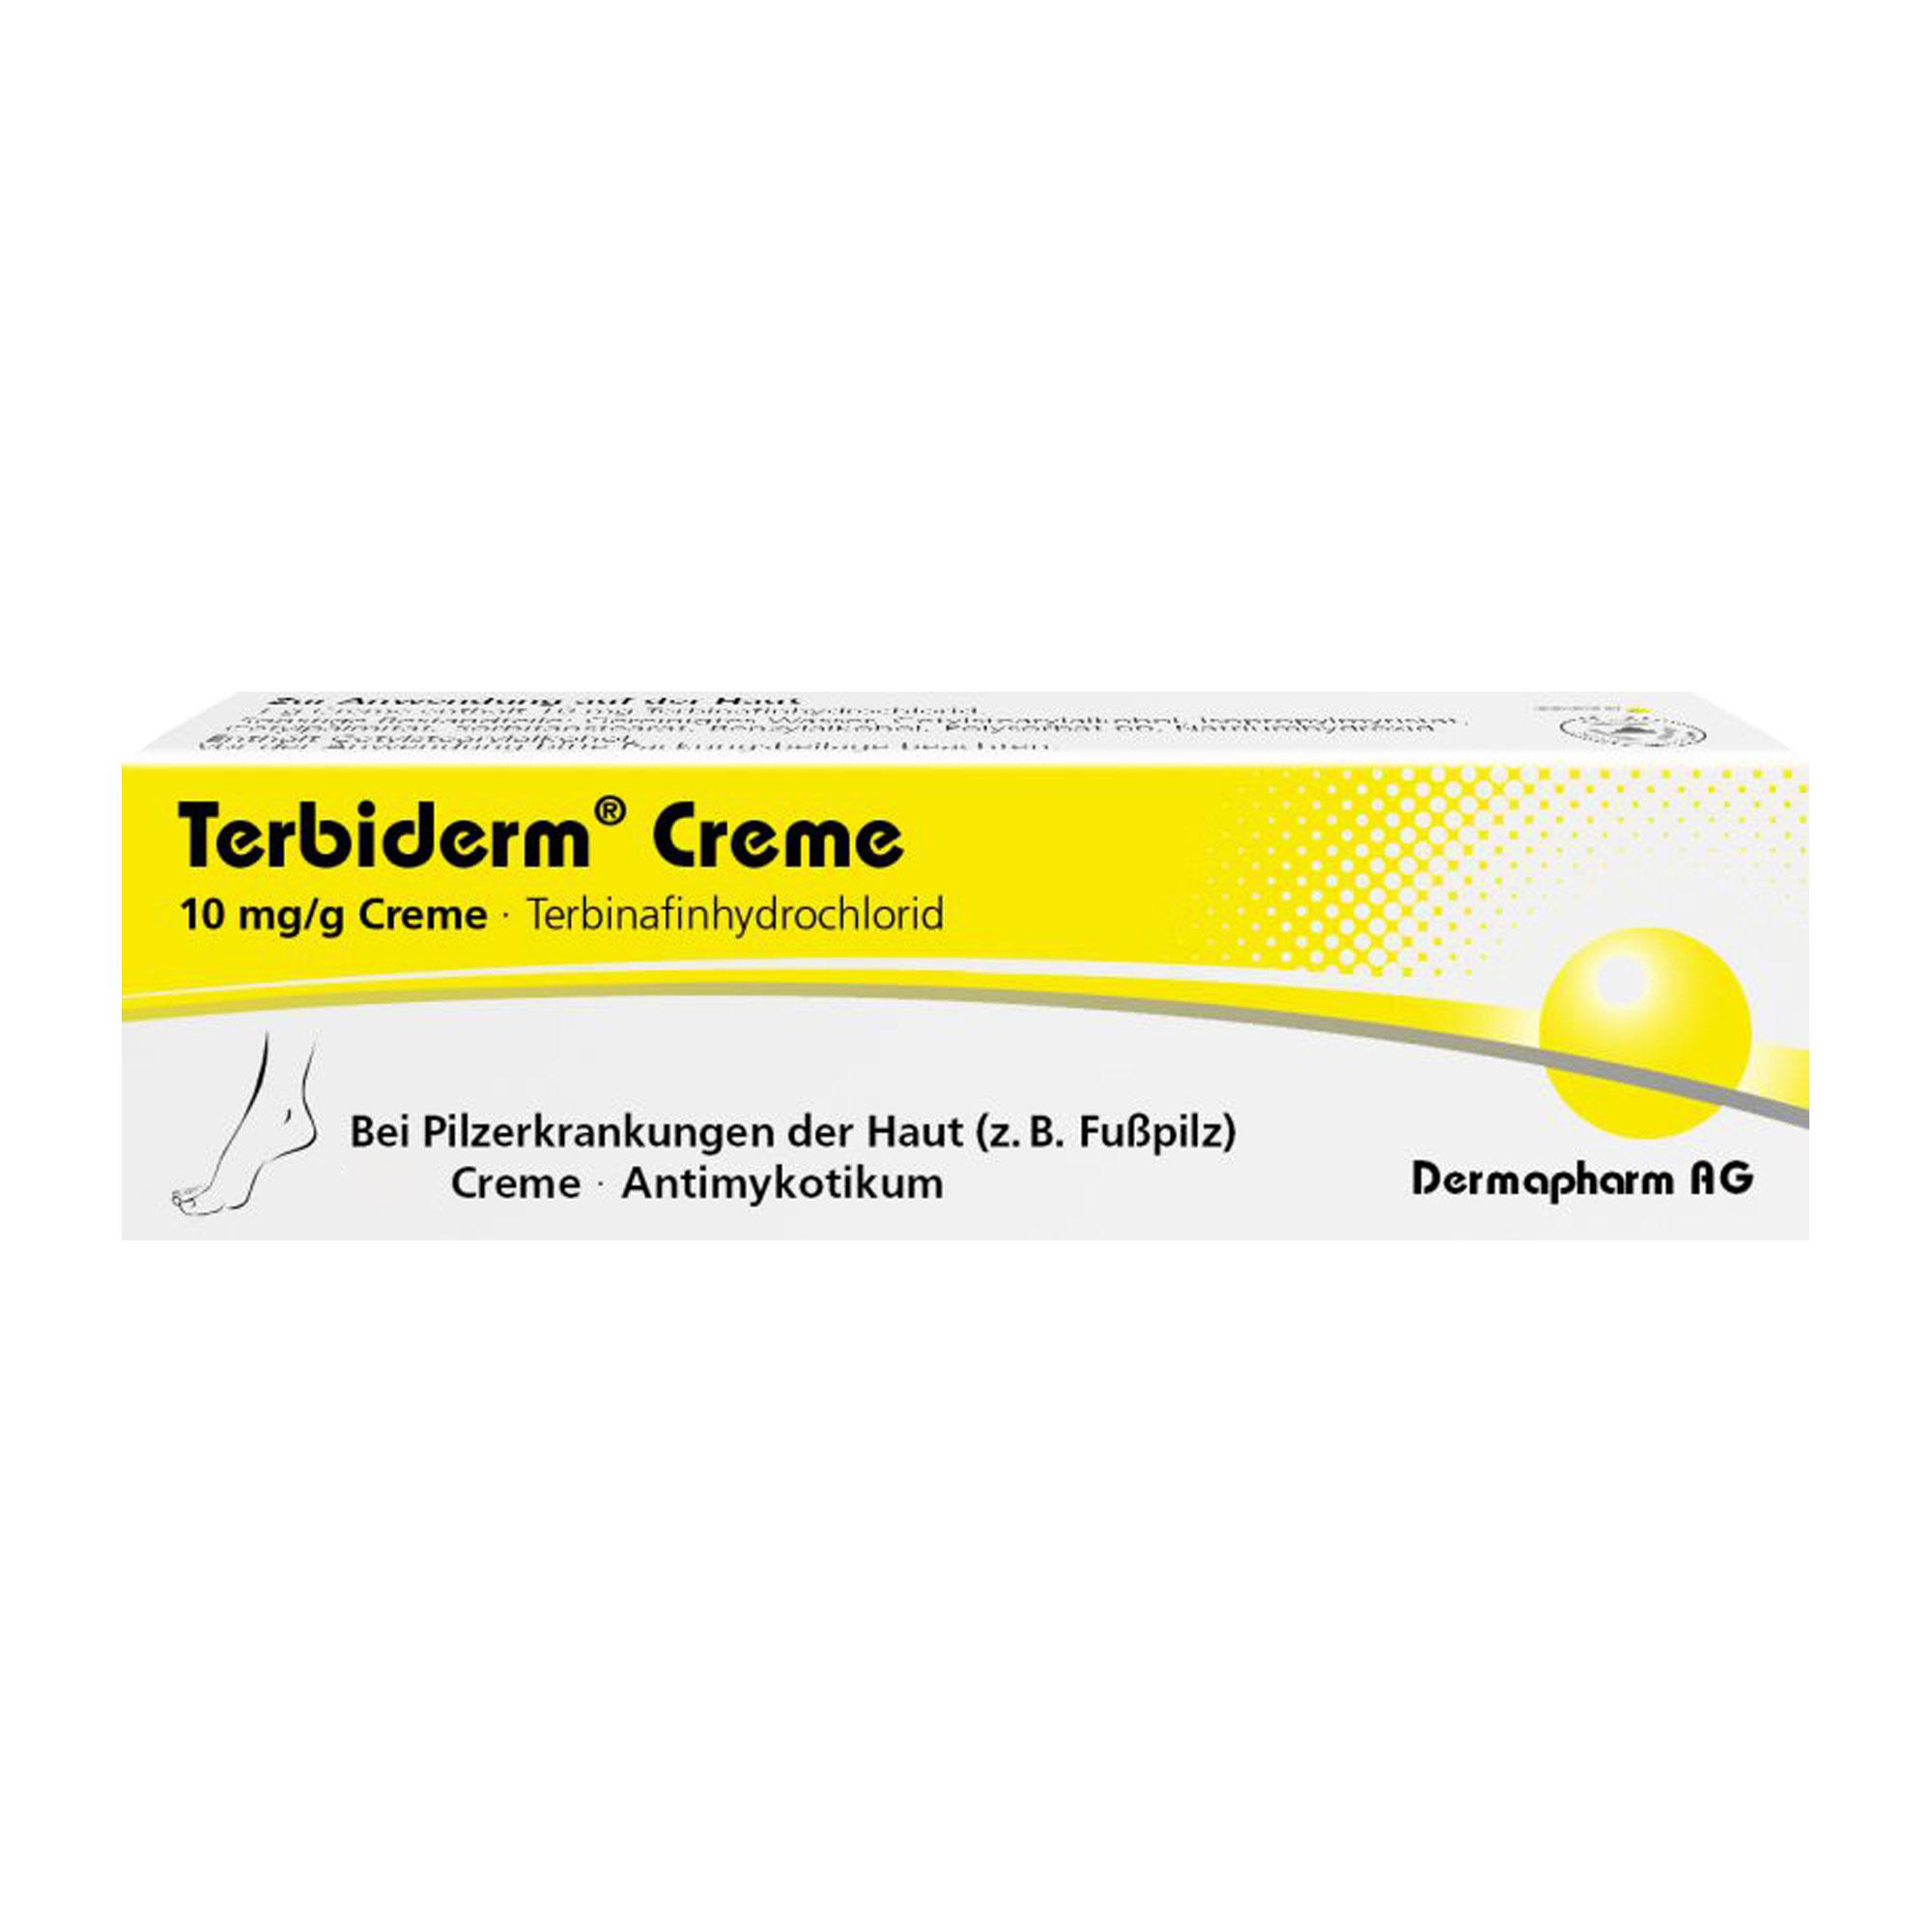 Terbiderm 10 mg/g Creme